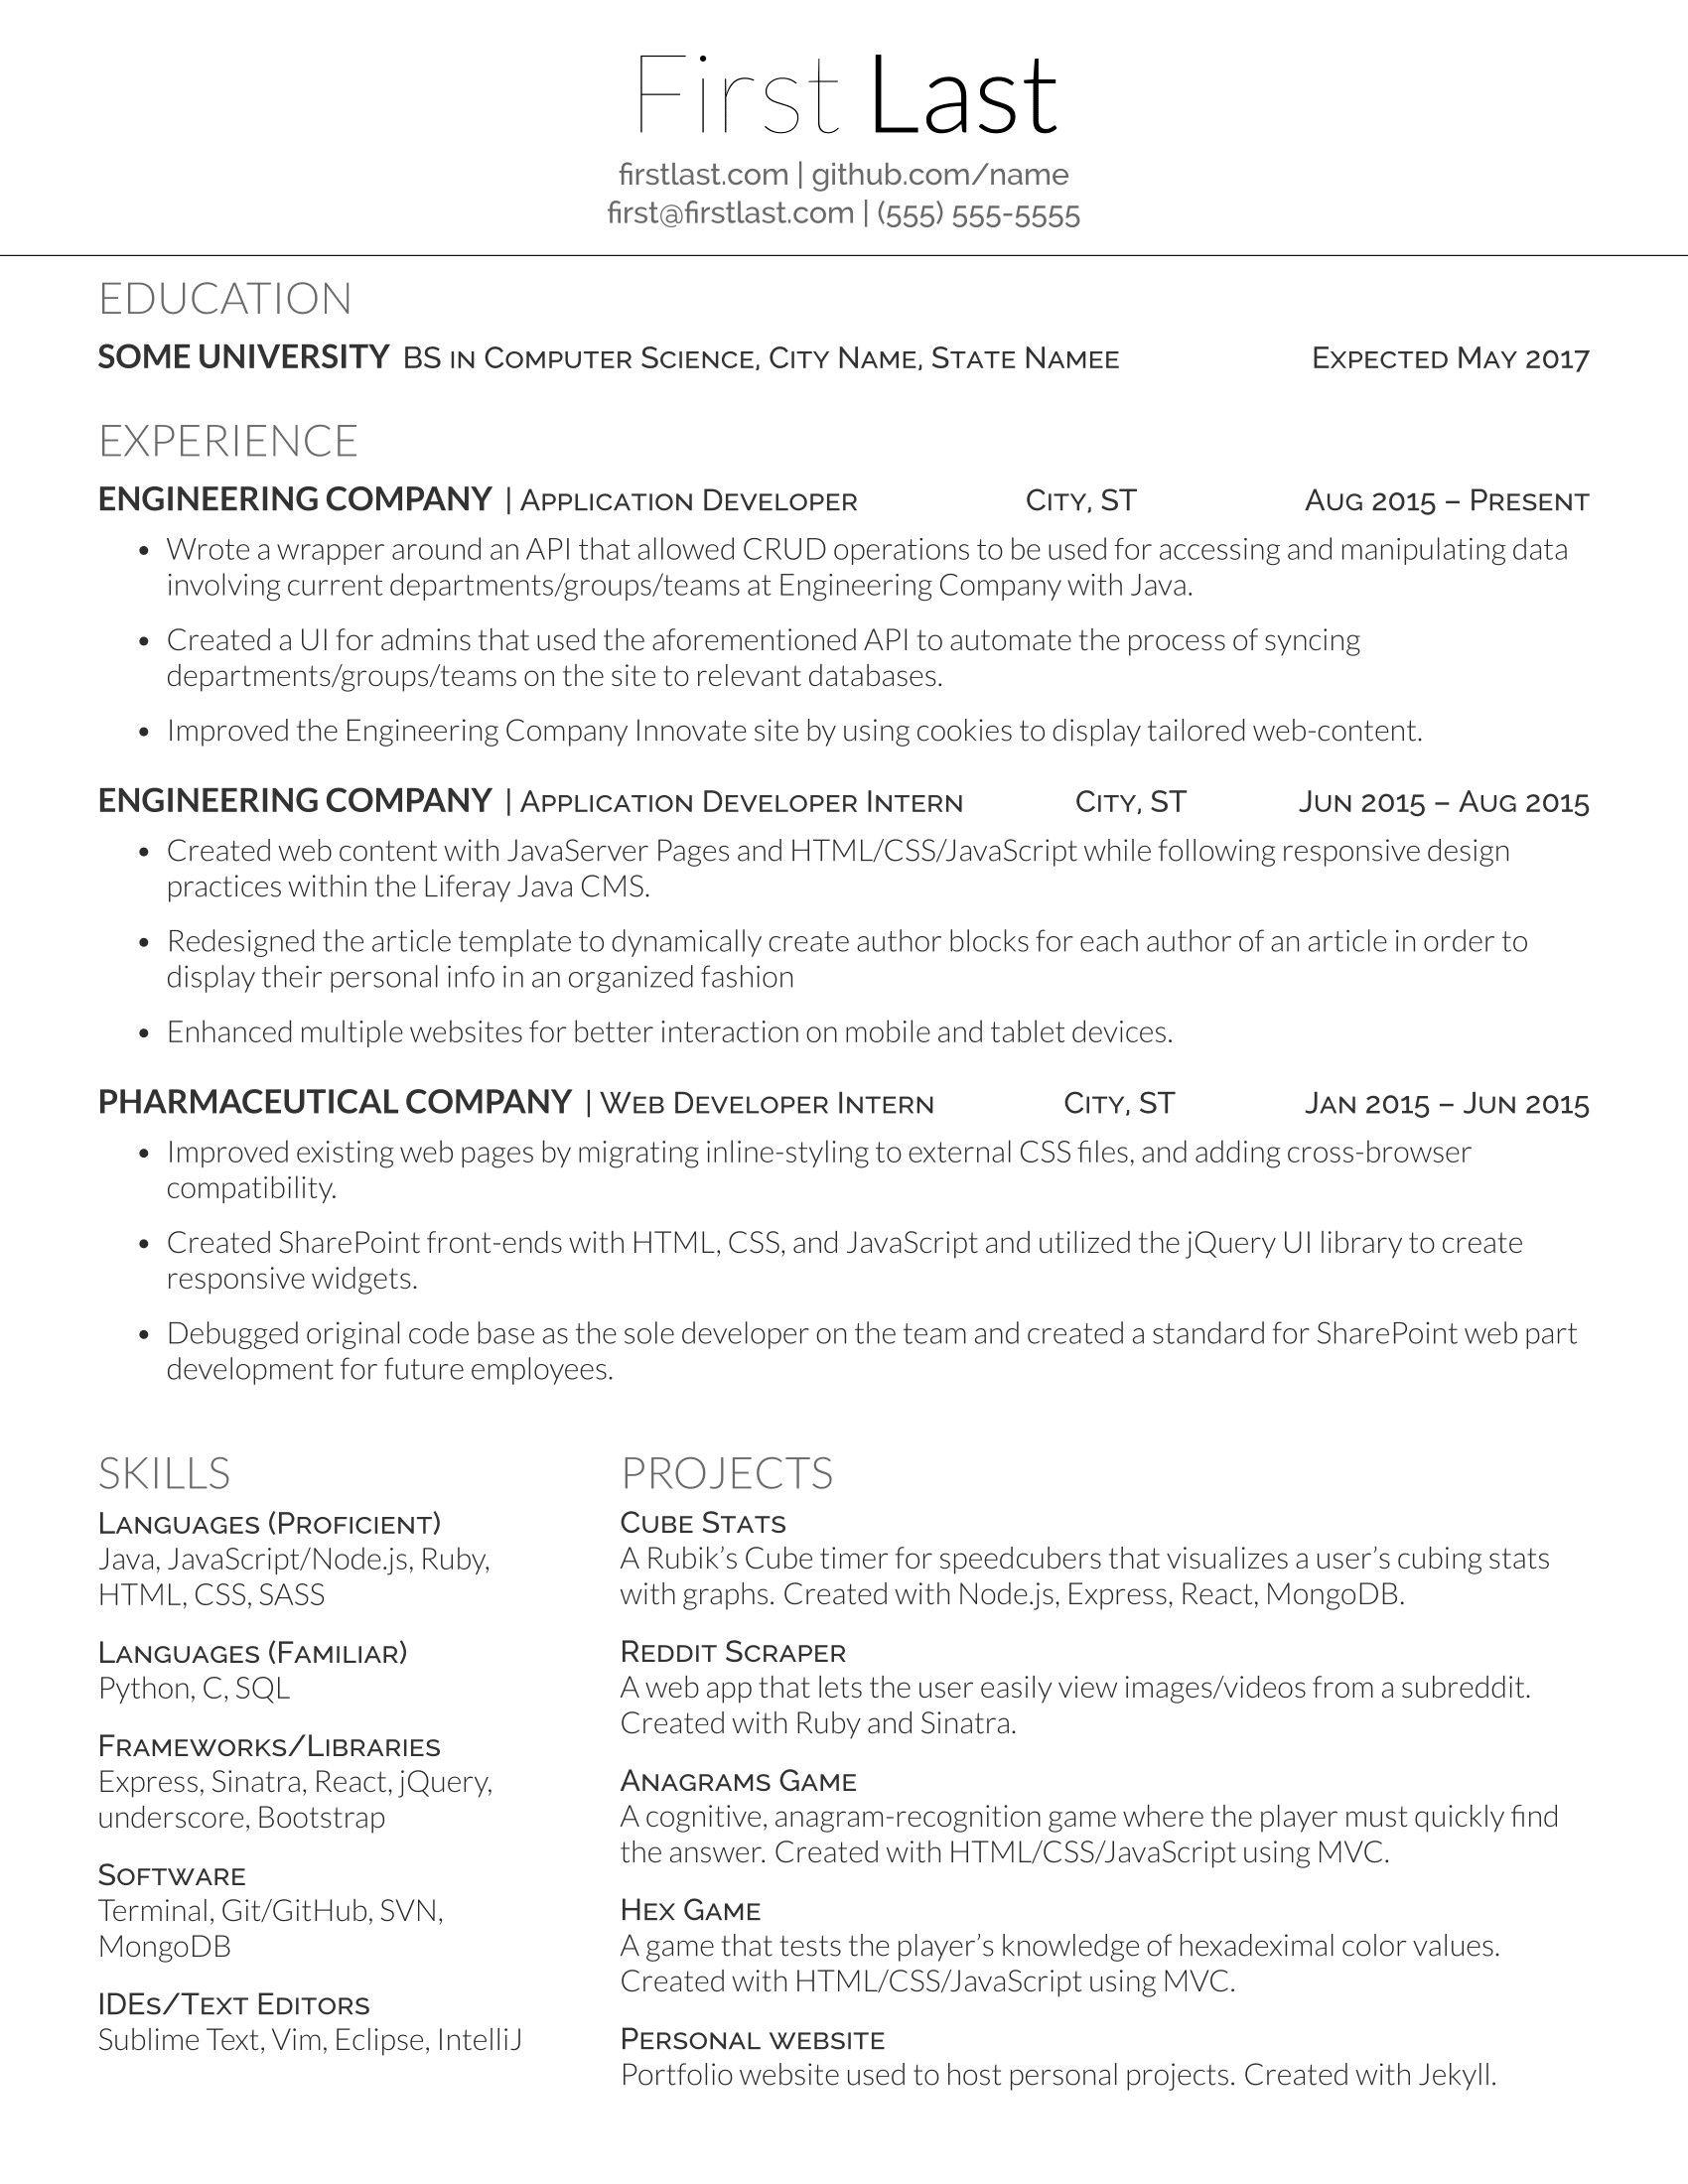 Resume Format Reddit Resume Templates Resume Template Examples Resume Format Job Resume Template